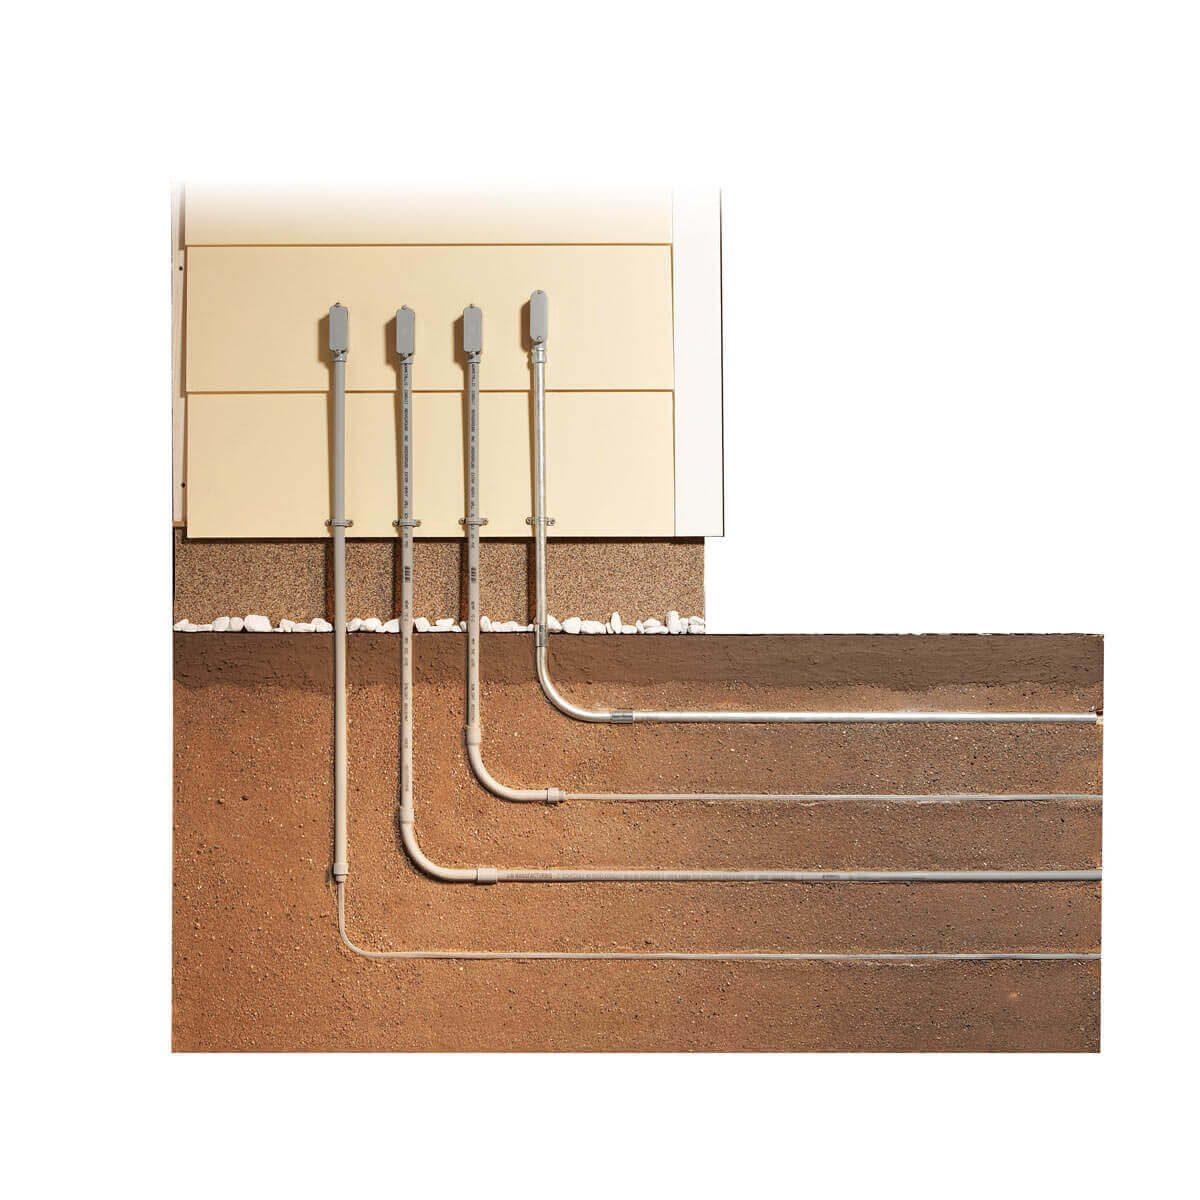 DIY-acro-21-FH08MAR_486_05_017_HSP-1200x1200